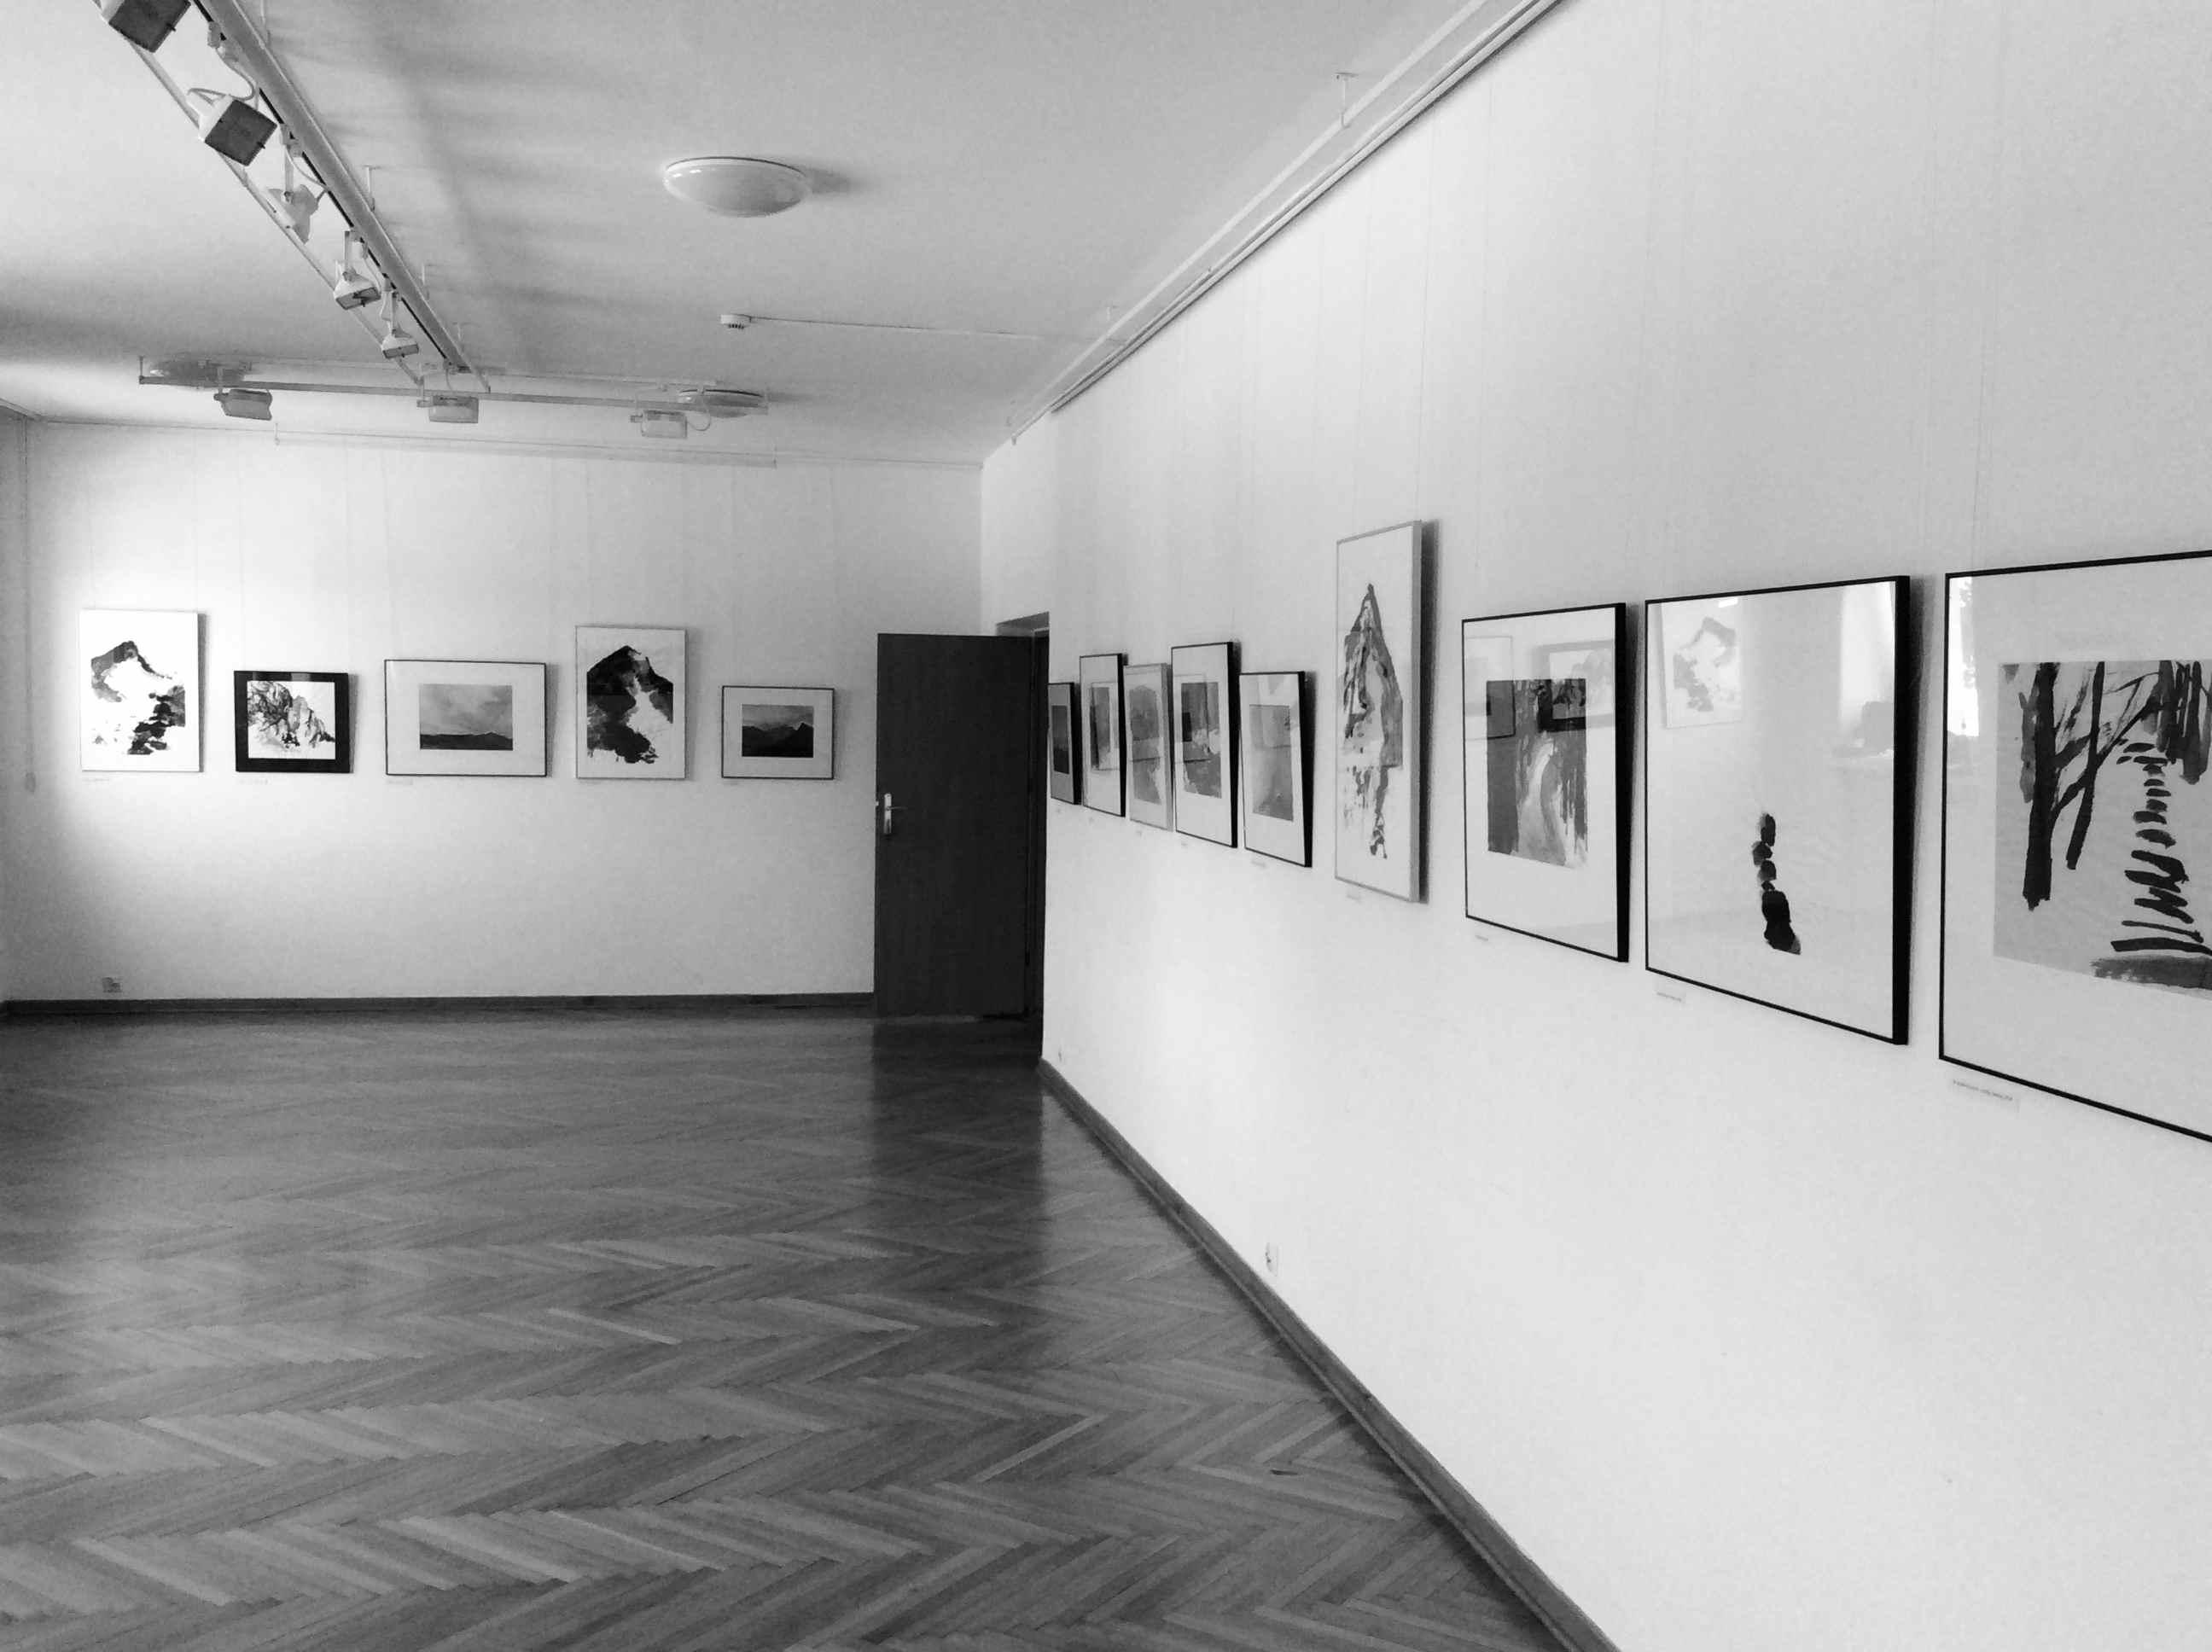 Young Artists Gallery Łazienkowska, Warsaw, 2019